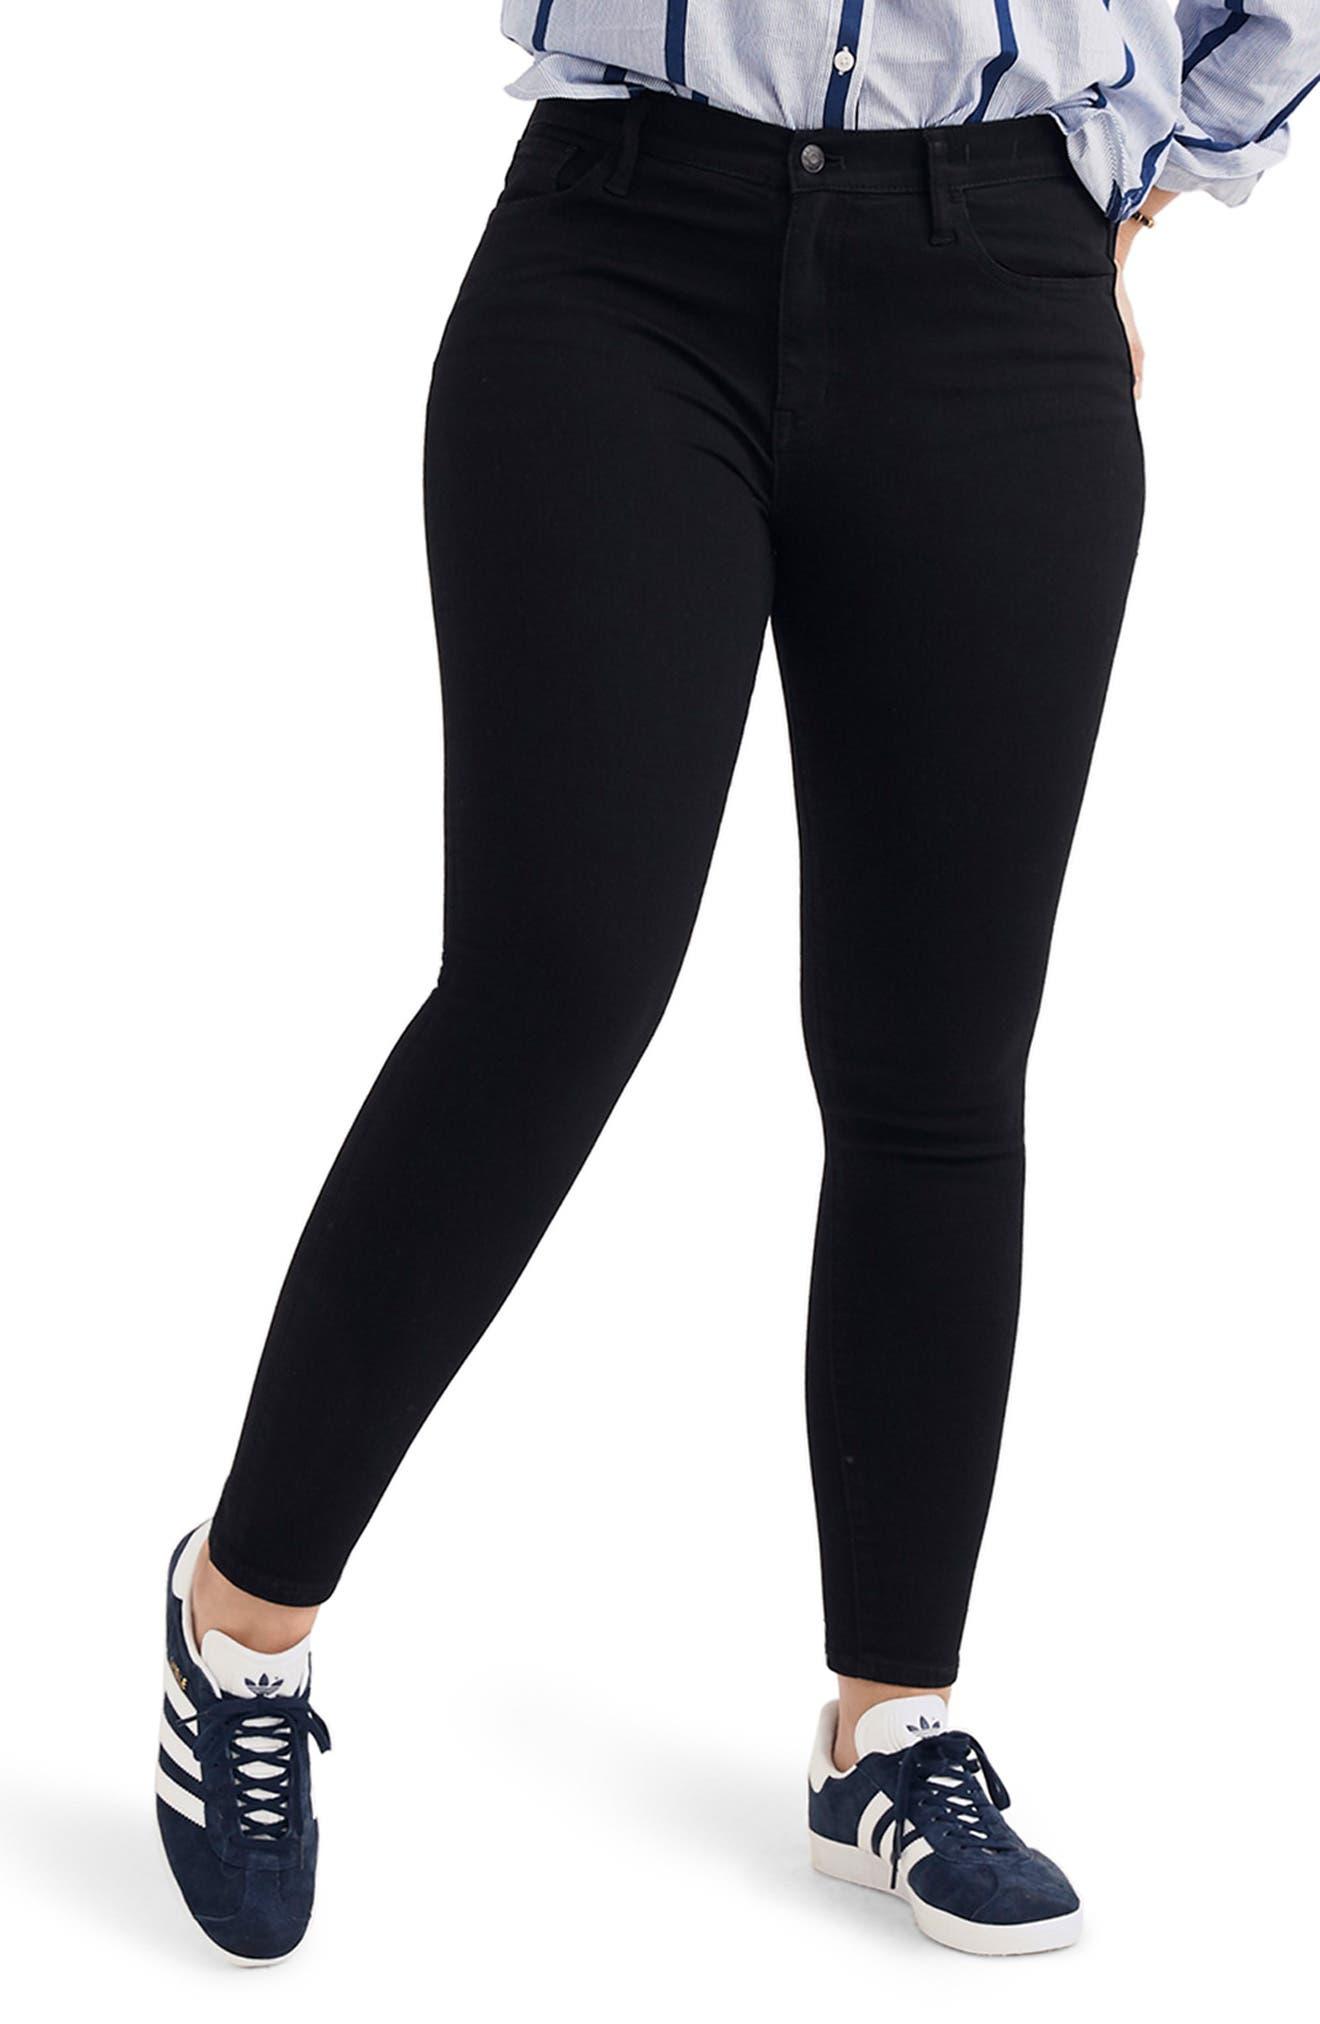 Roadtripper Skinny Jeans,                             Alternate thumbnail 2, color,                             BENNET WASH